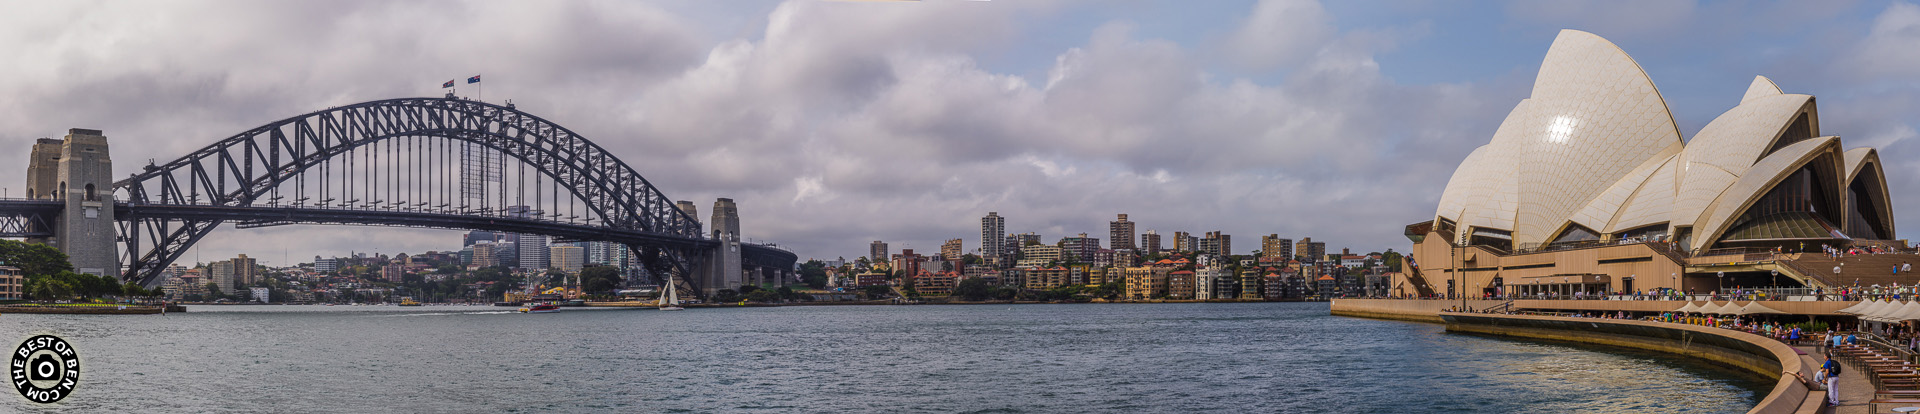 Sydney_20